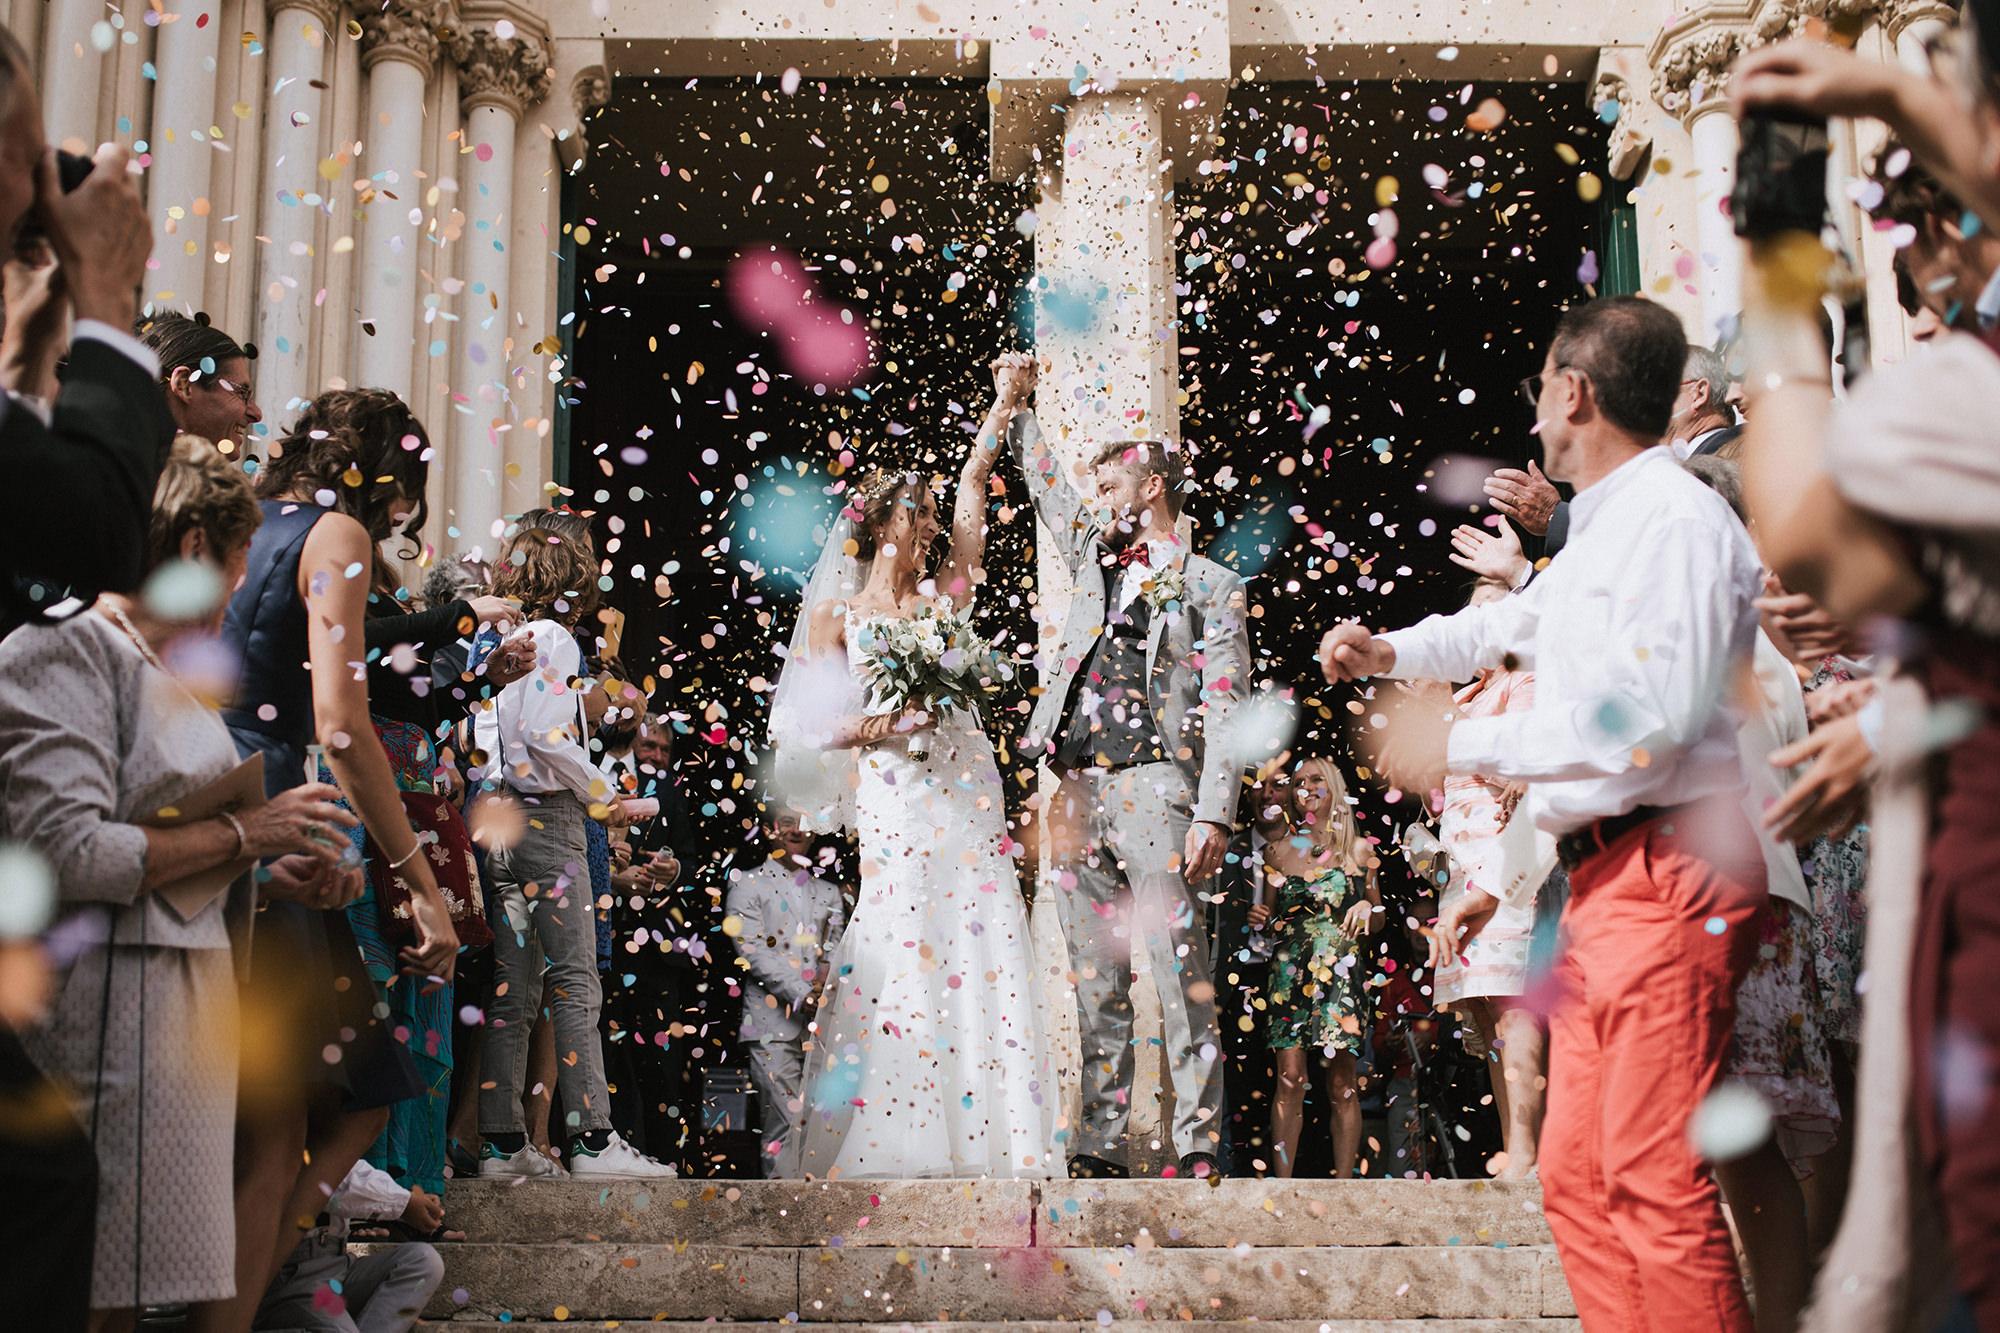 Wedding_Montpellier_chateau_de_la_mogere_Alice+Alexis_neupapphotography-439.jpg